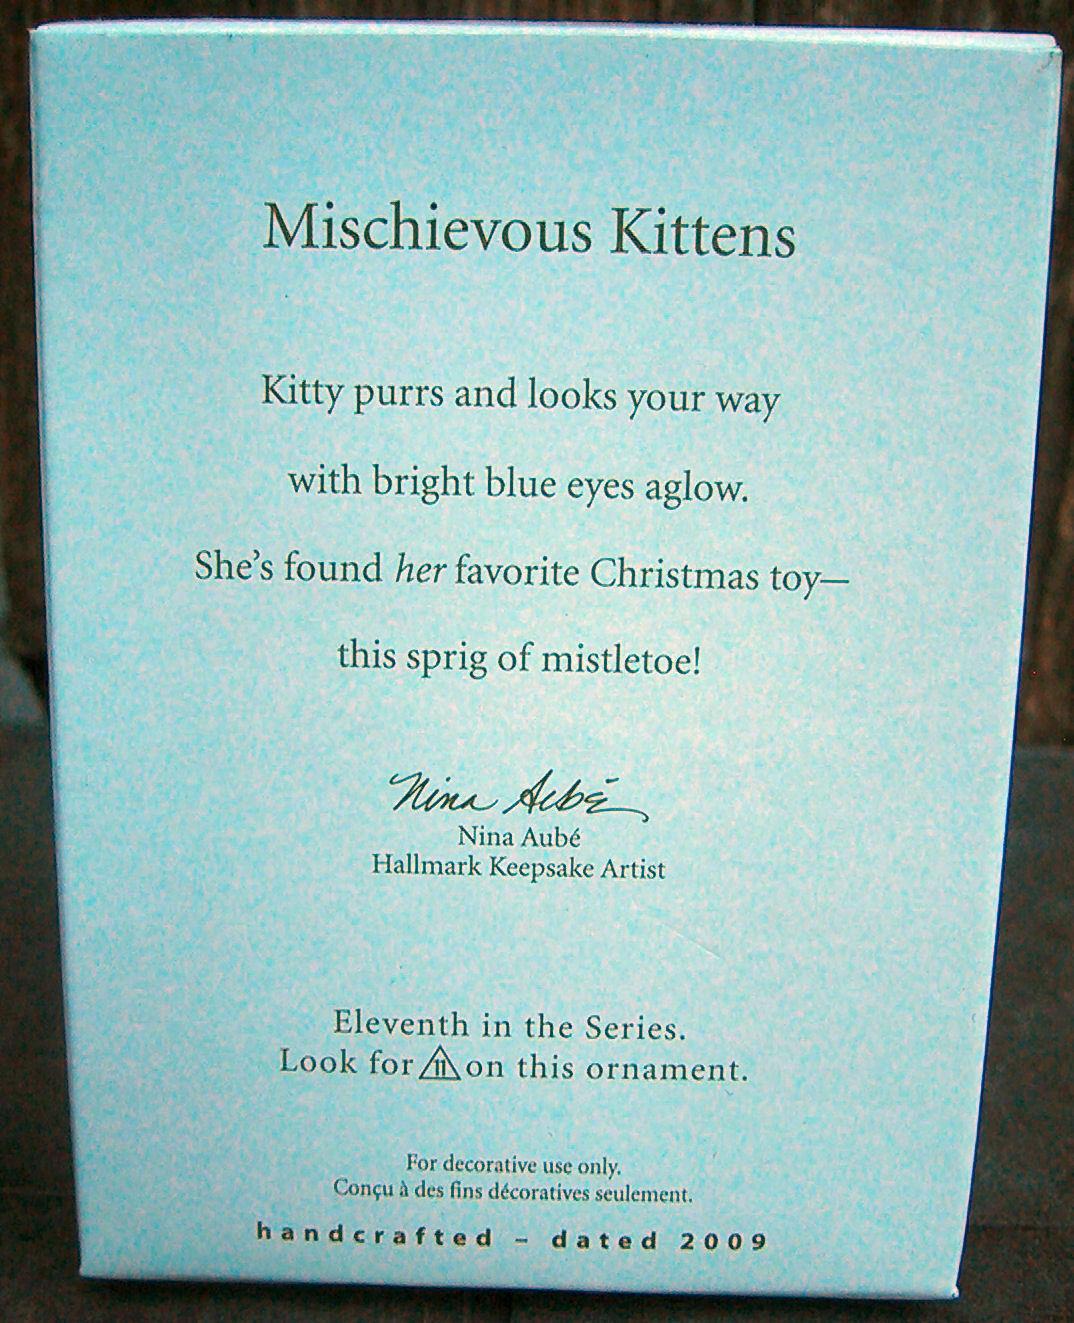 Hallmark Mischievous Kittens 11th in Series image 2